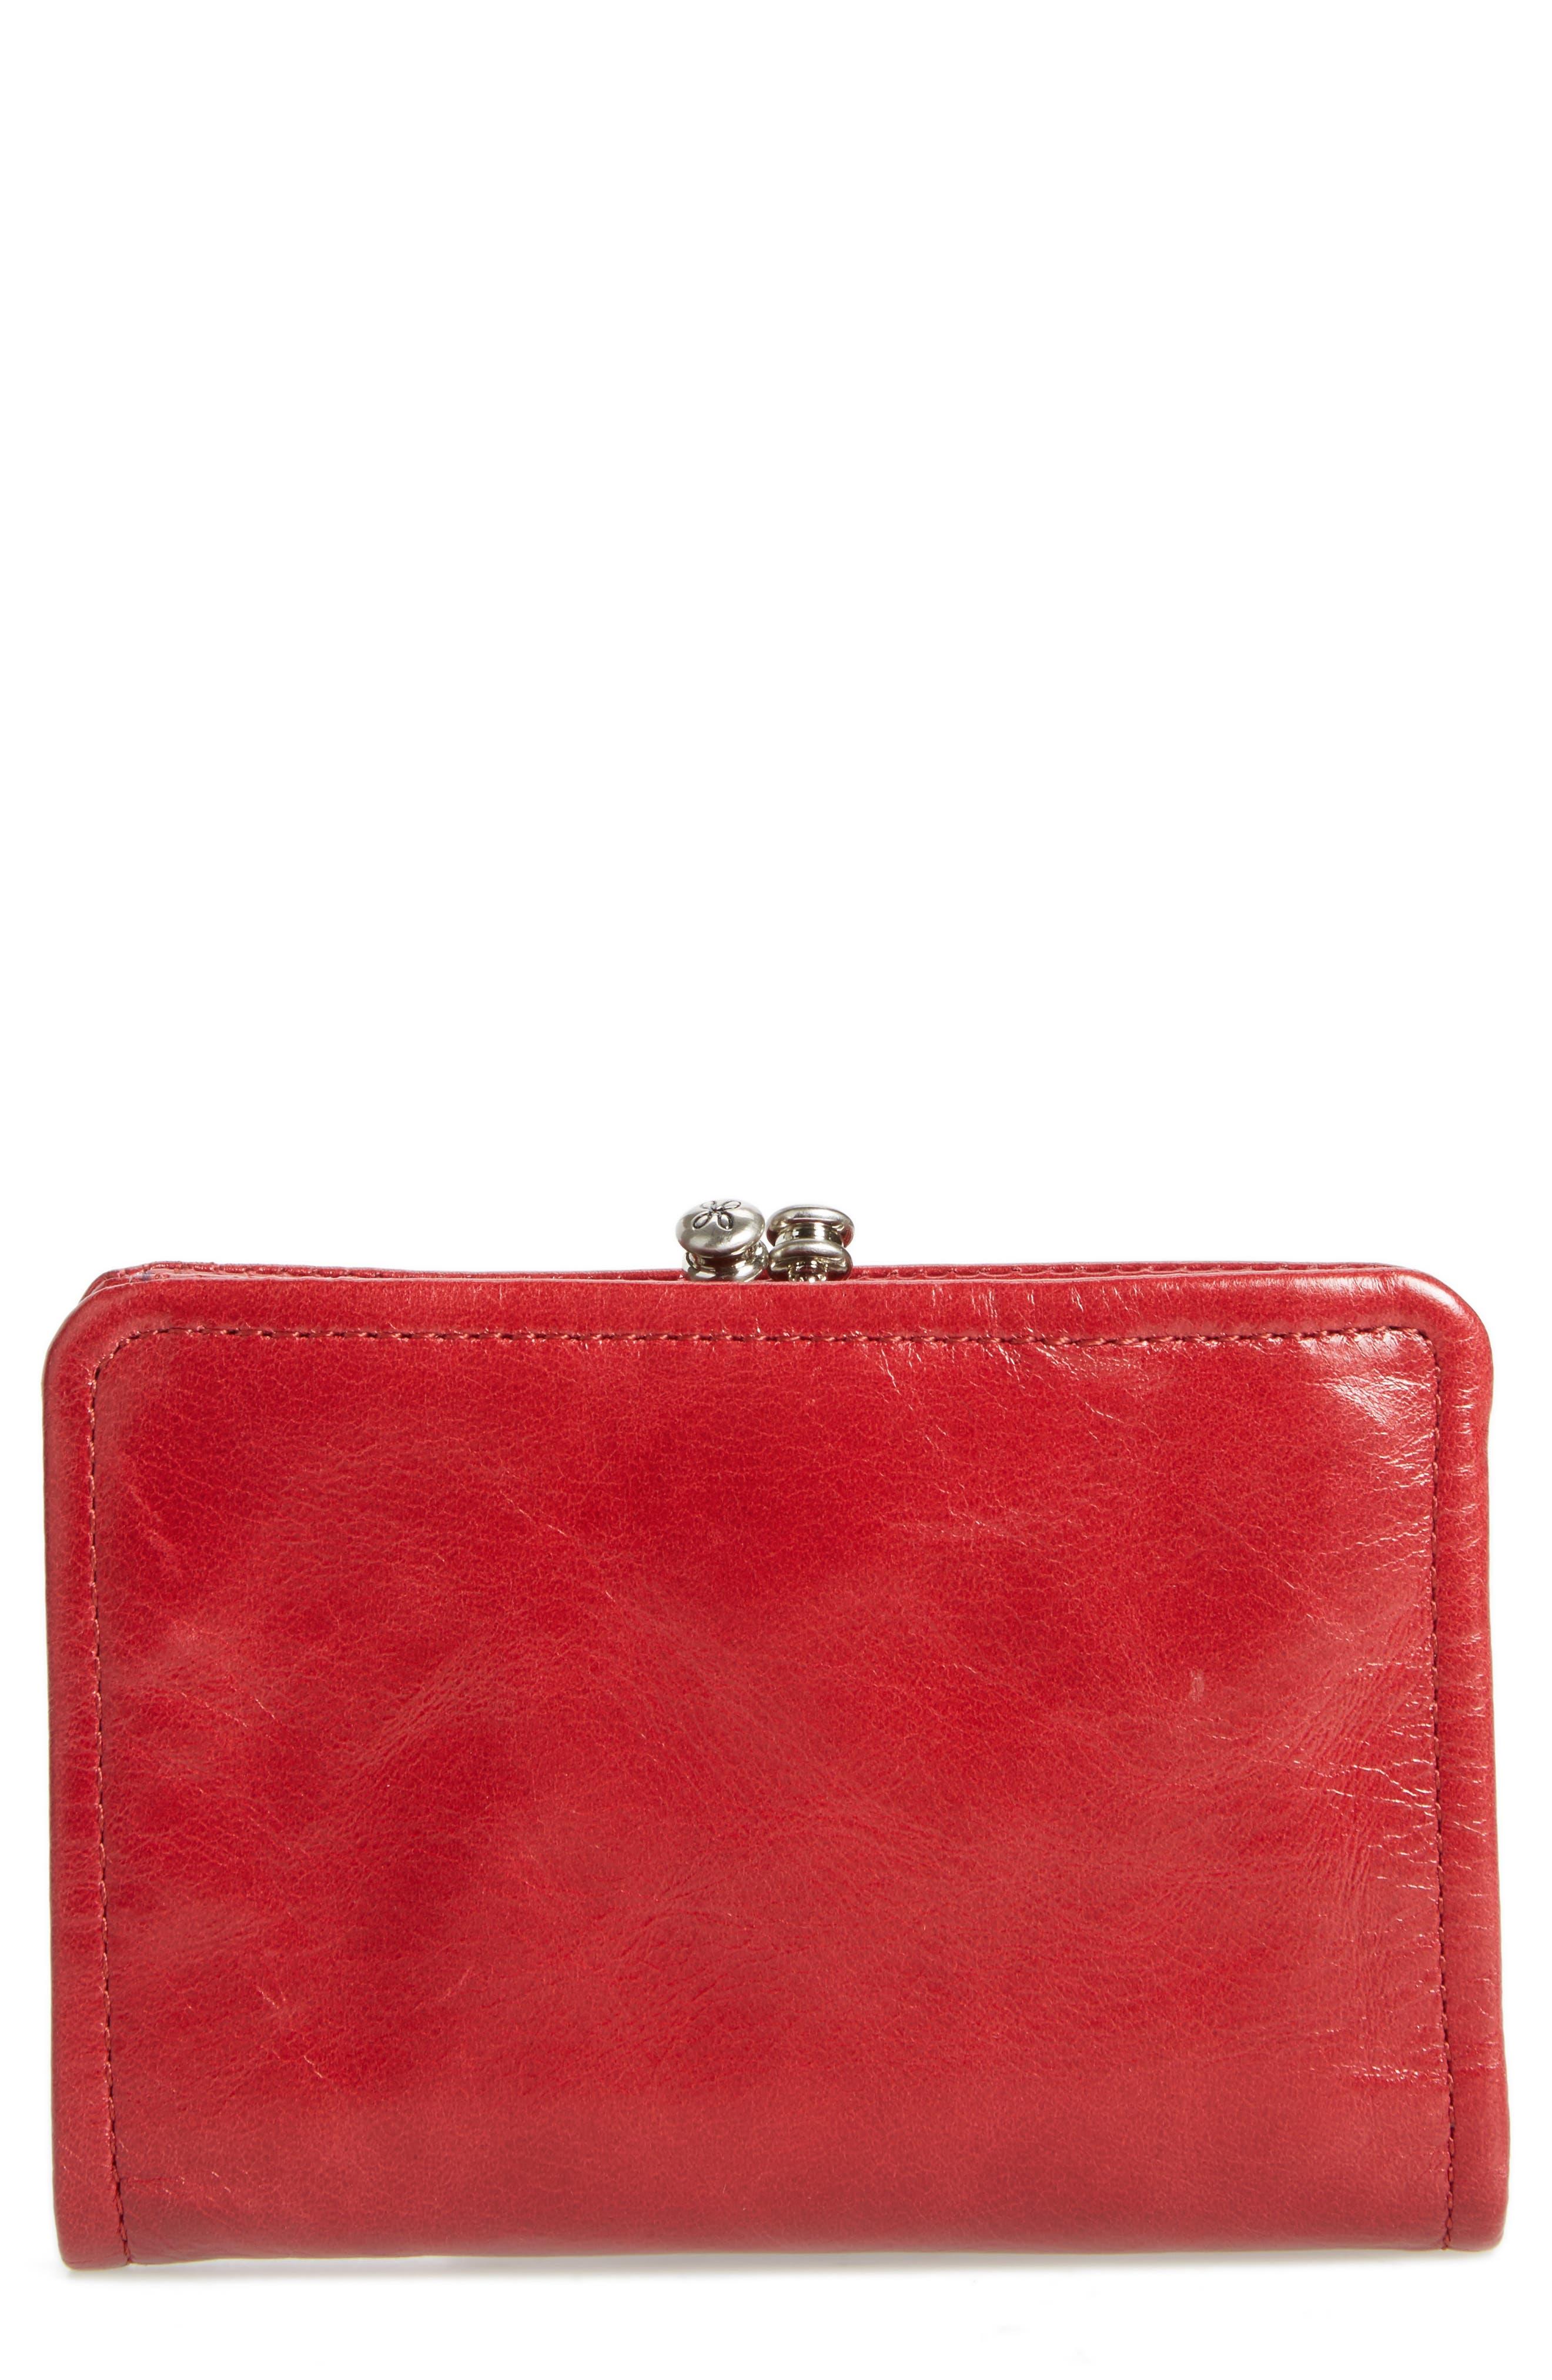 Delta Calfskin Leather Wallet,                         Main,                         color, Cardinal